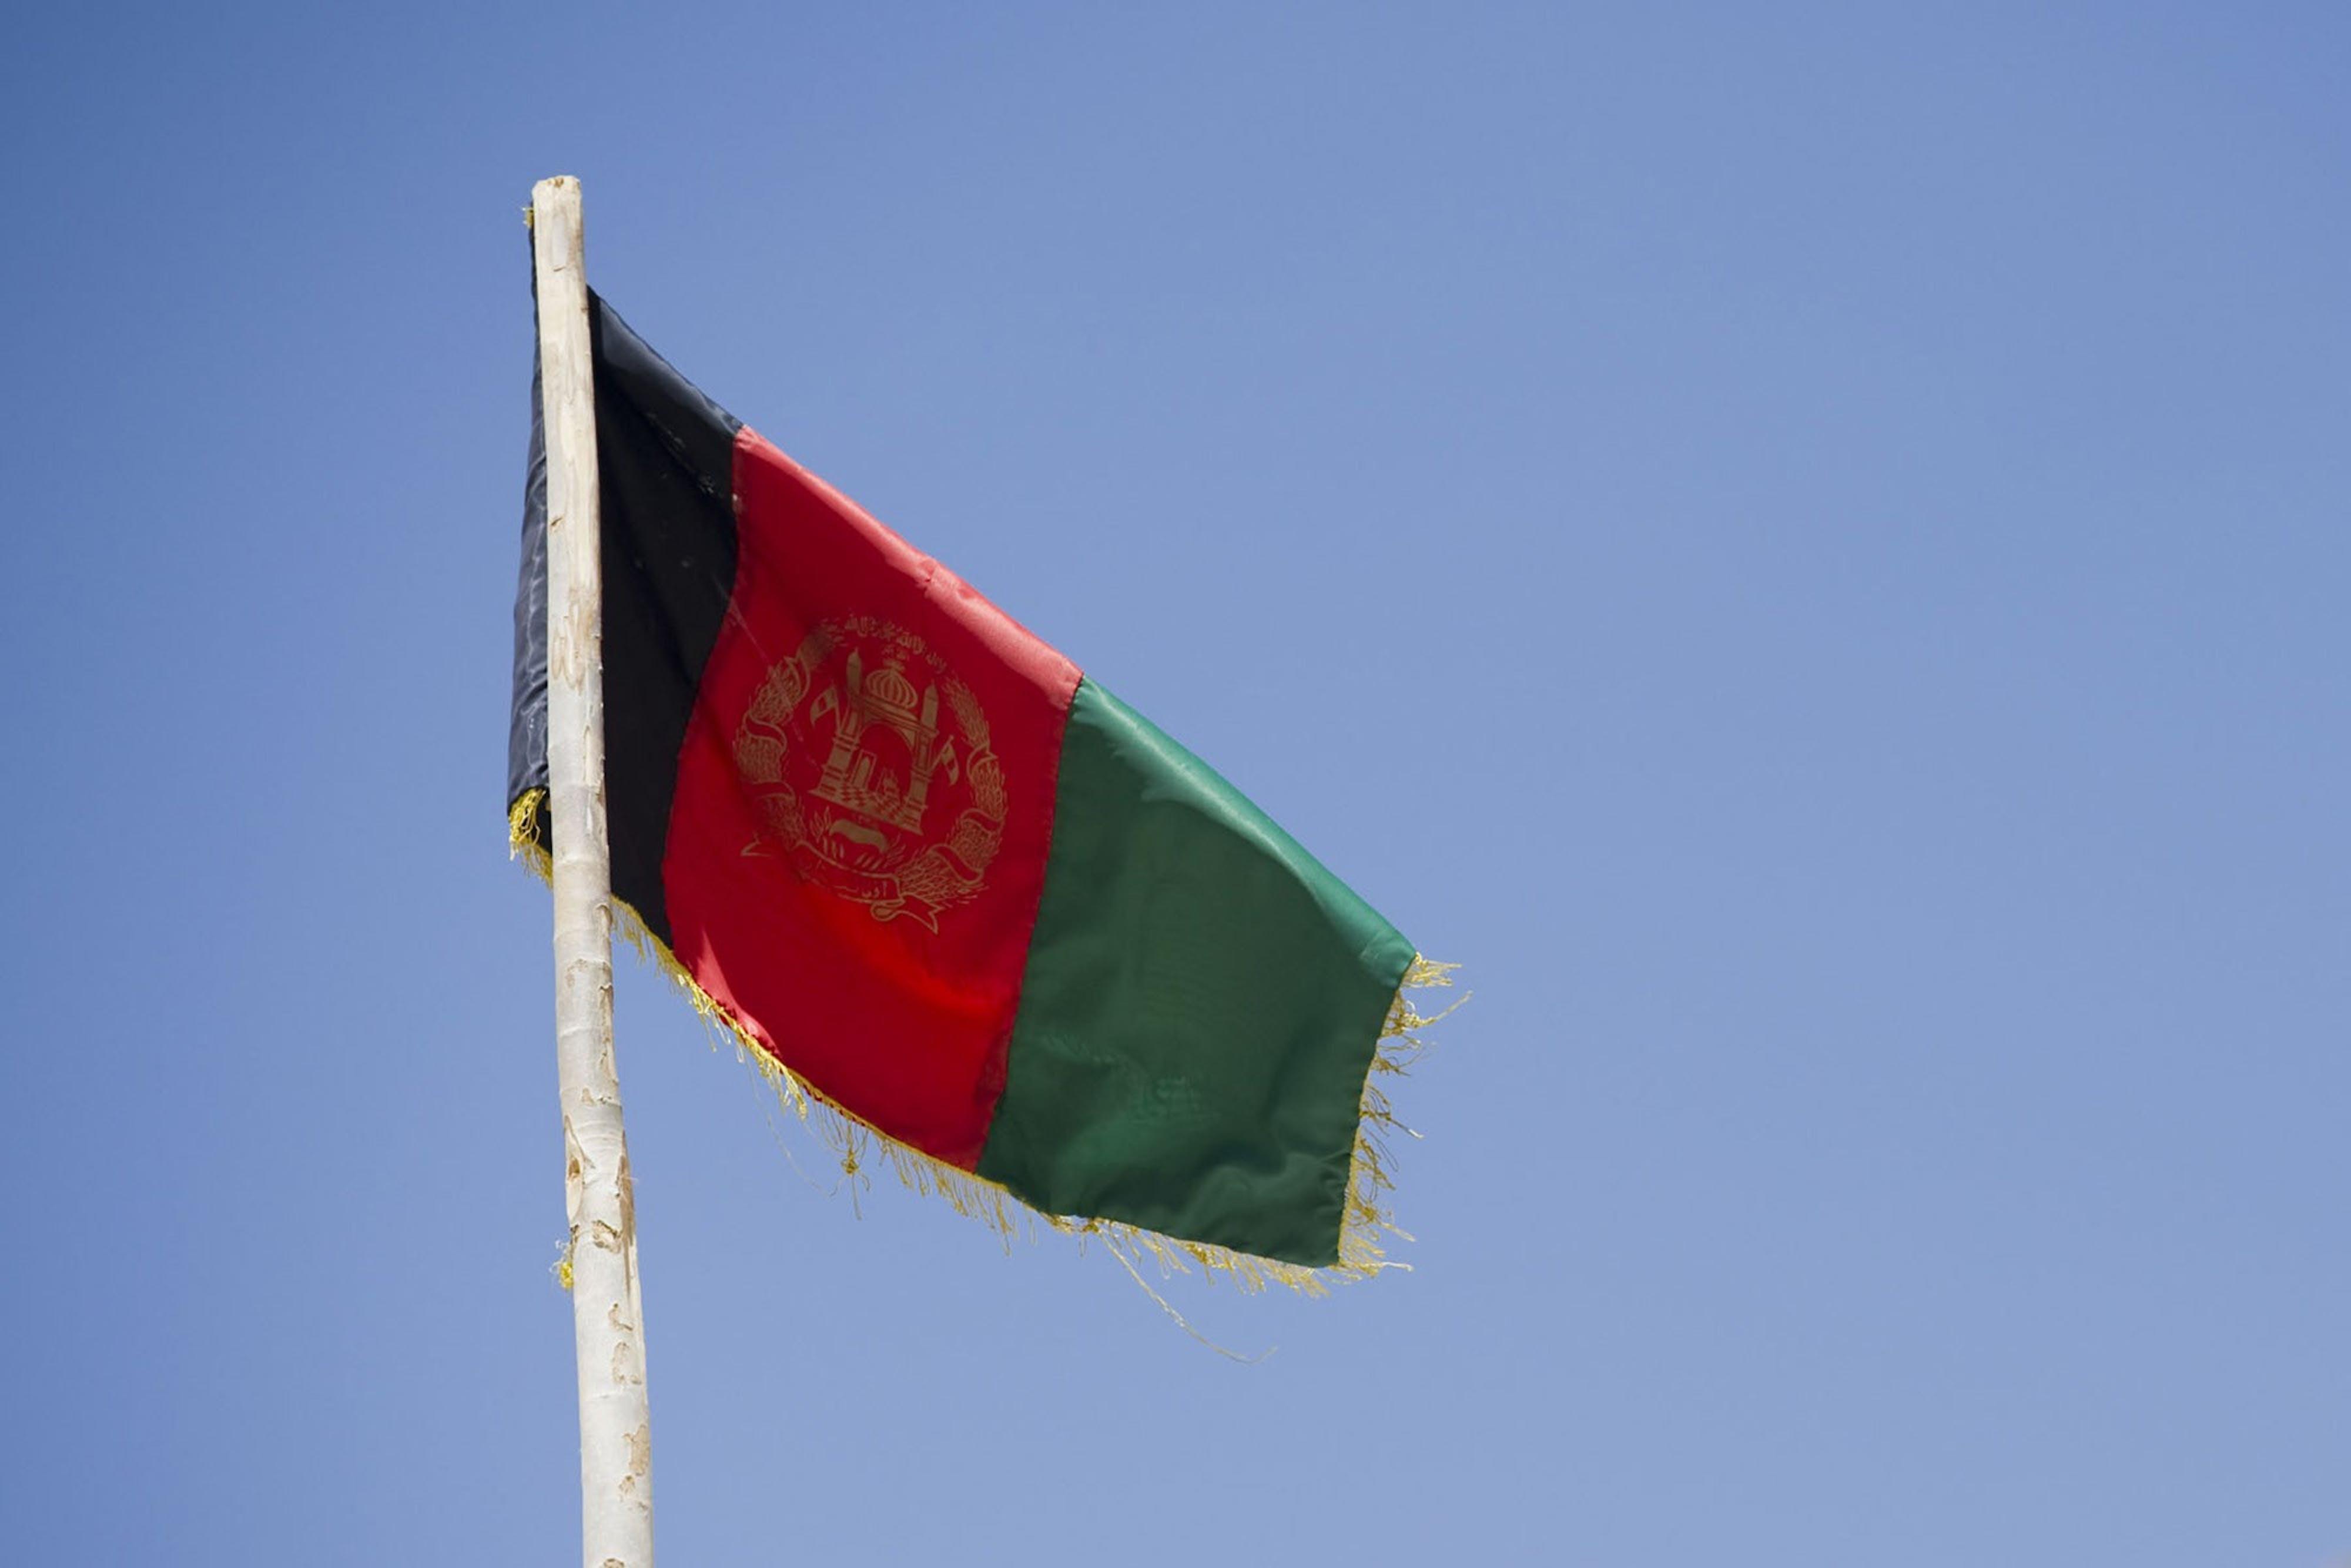 afghan-flag-photo